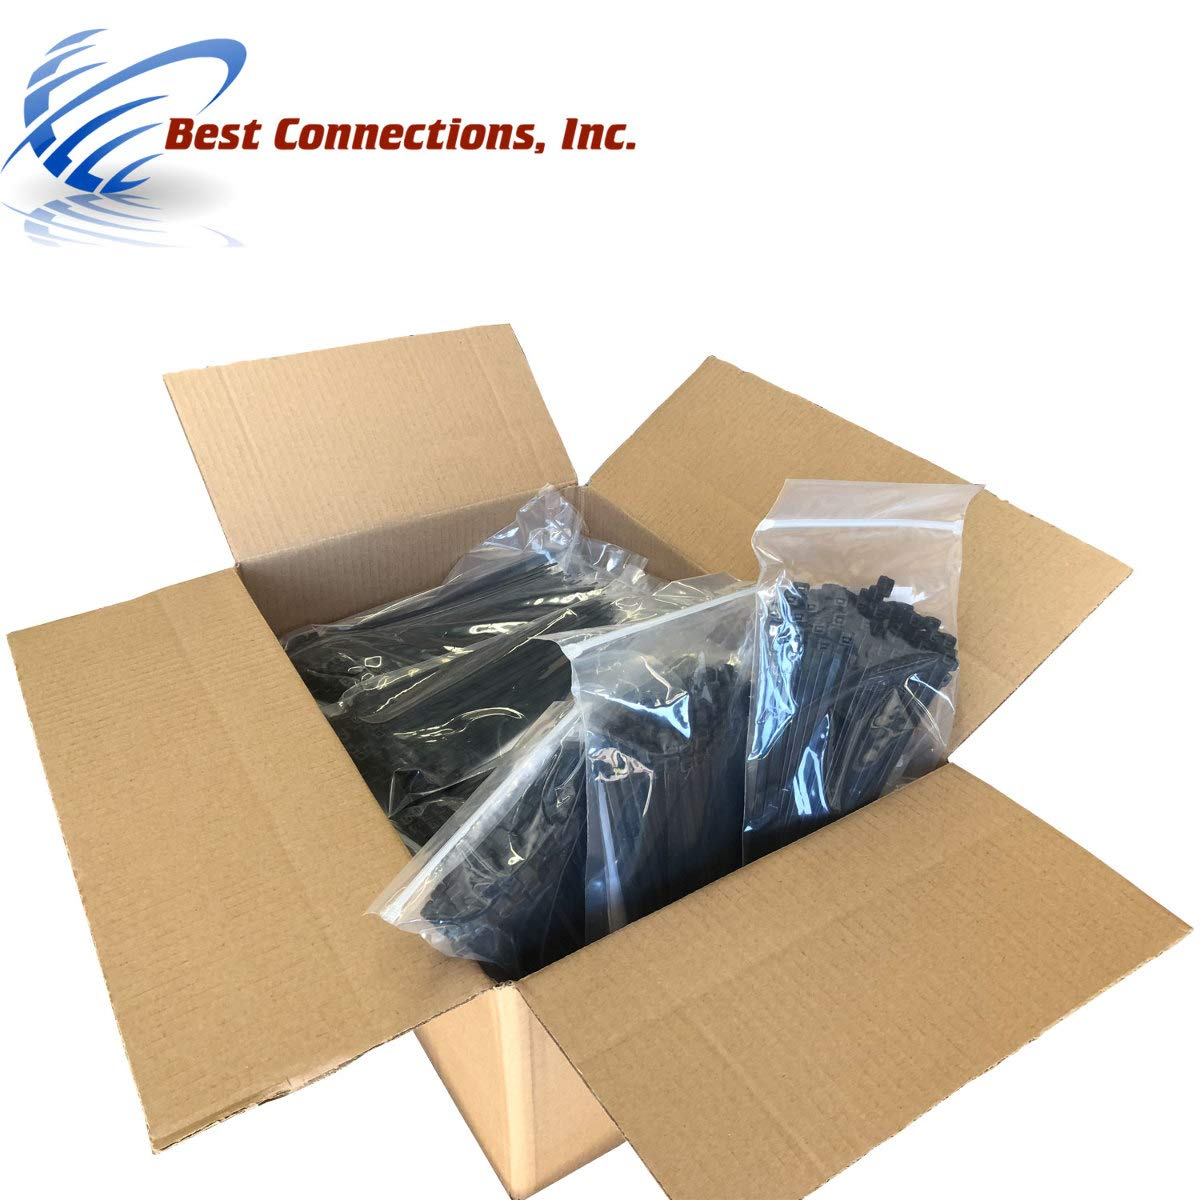 10,000 Pcs 7'' Black Nylon Cable Zip Ties 50 Lbs Tensile Strength